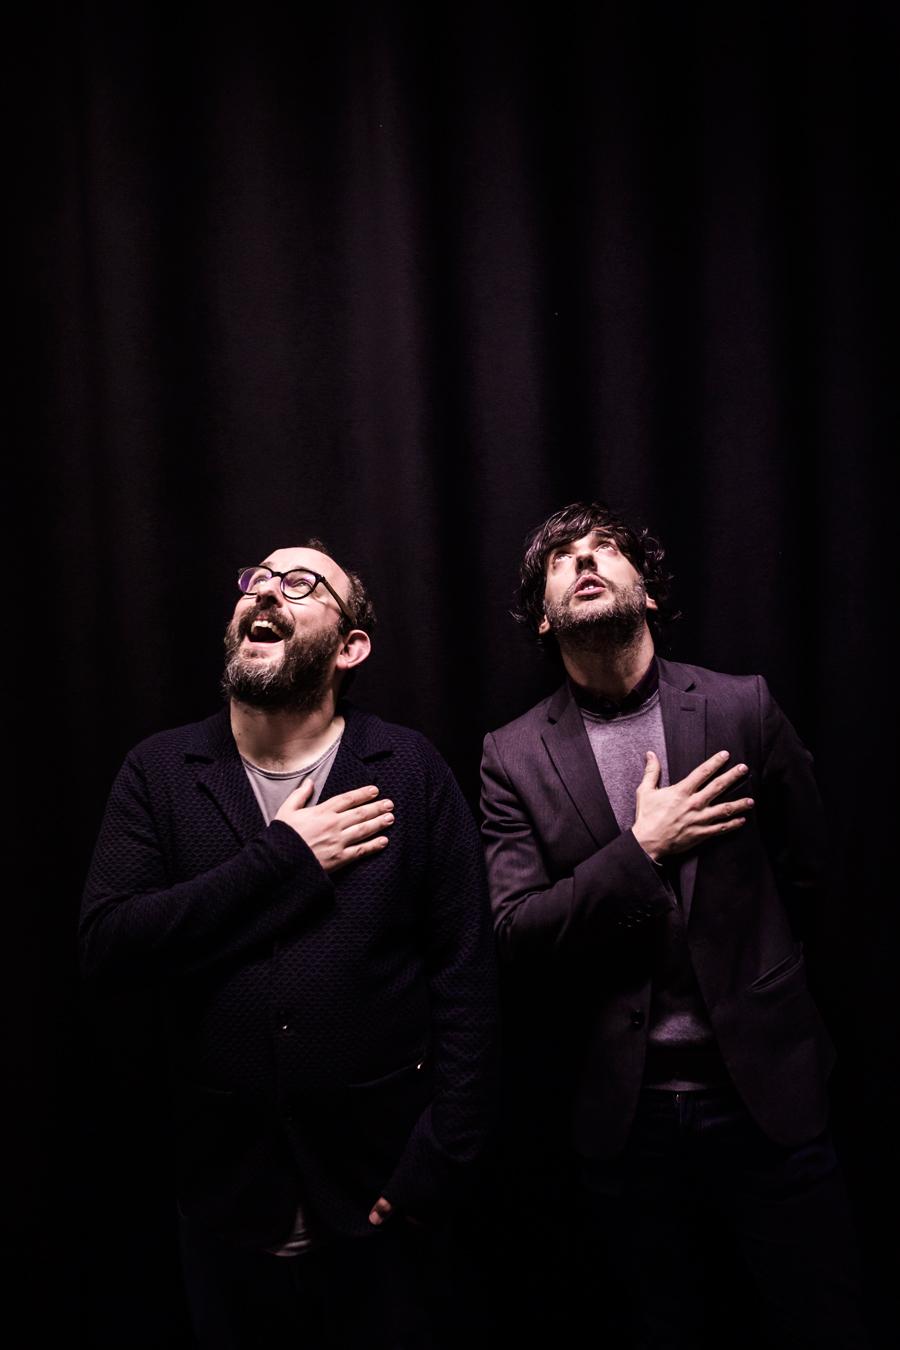 Borja Cobeaga et Diego San José 2018 ©Jorge Fuembuena